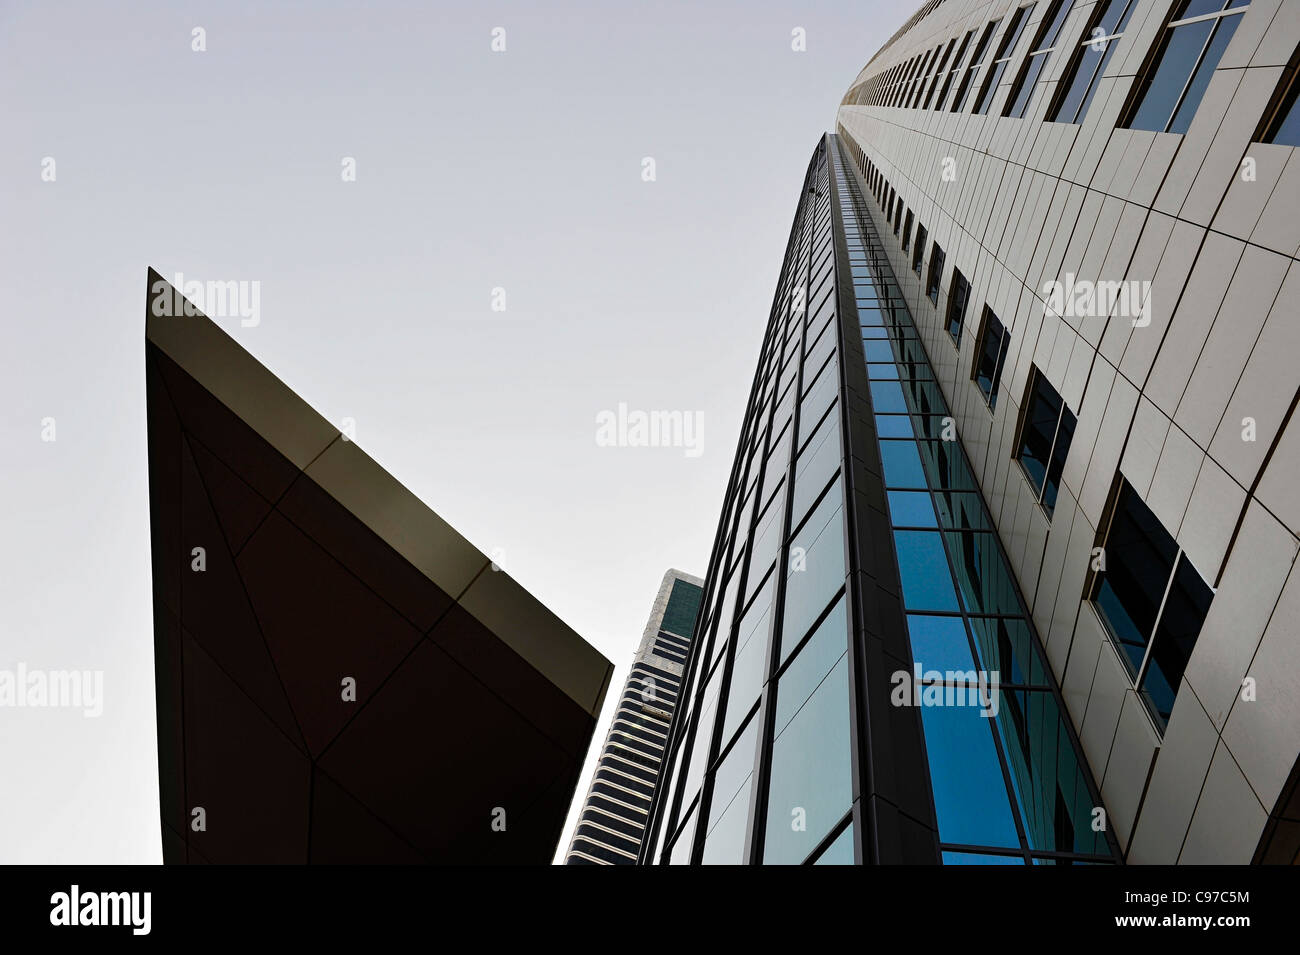 Facade, new luxury hotel THE PLACE, Sheikh Zayed Road, Al Satwa, Dubai, United Arab Emirates, Middle East - Stock Image